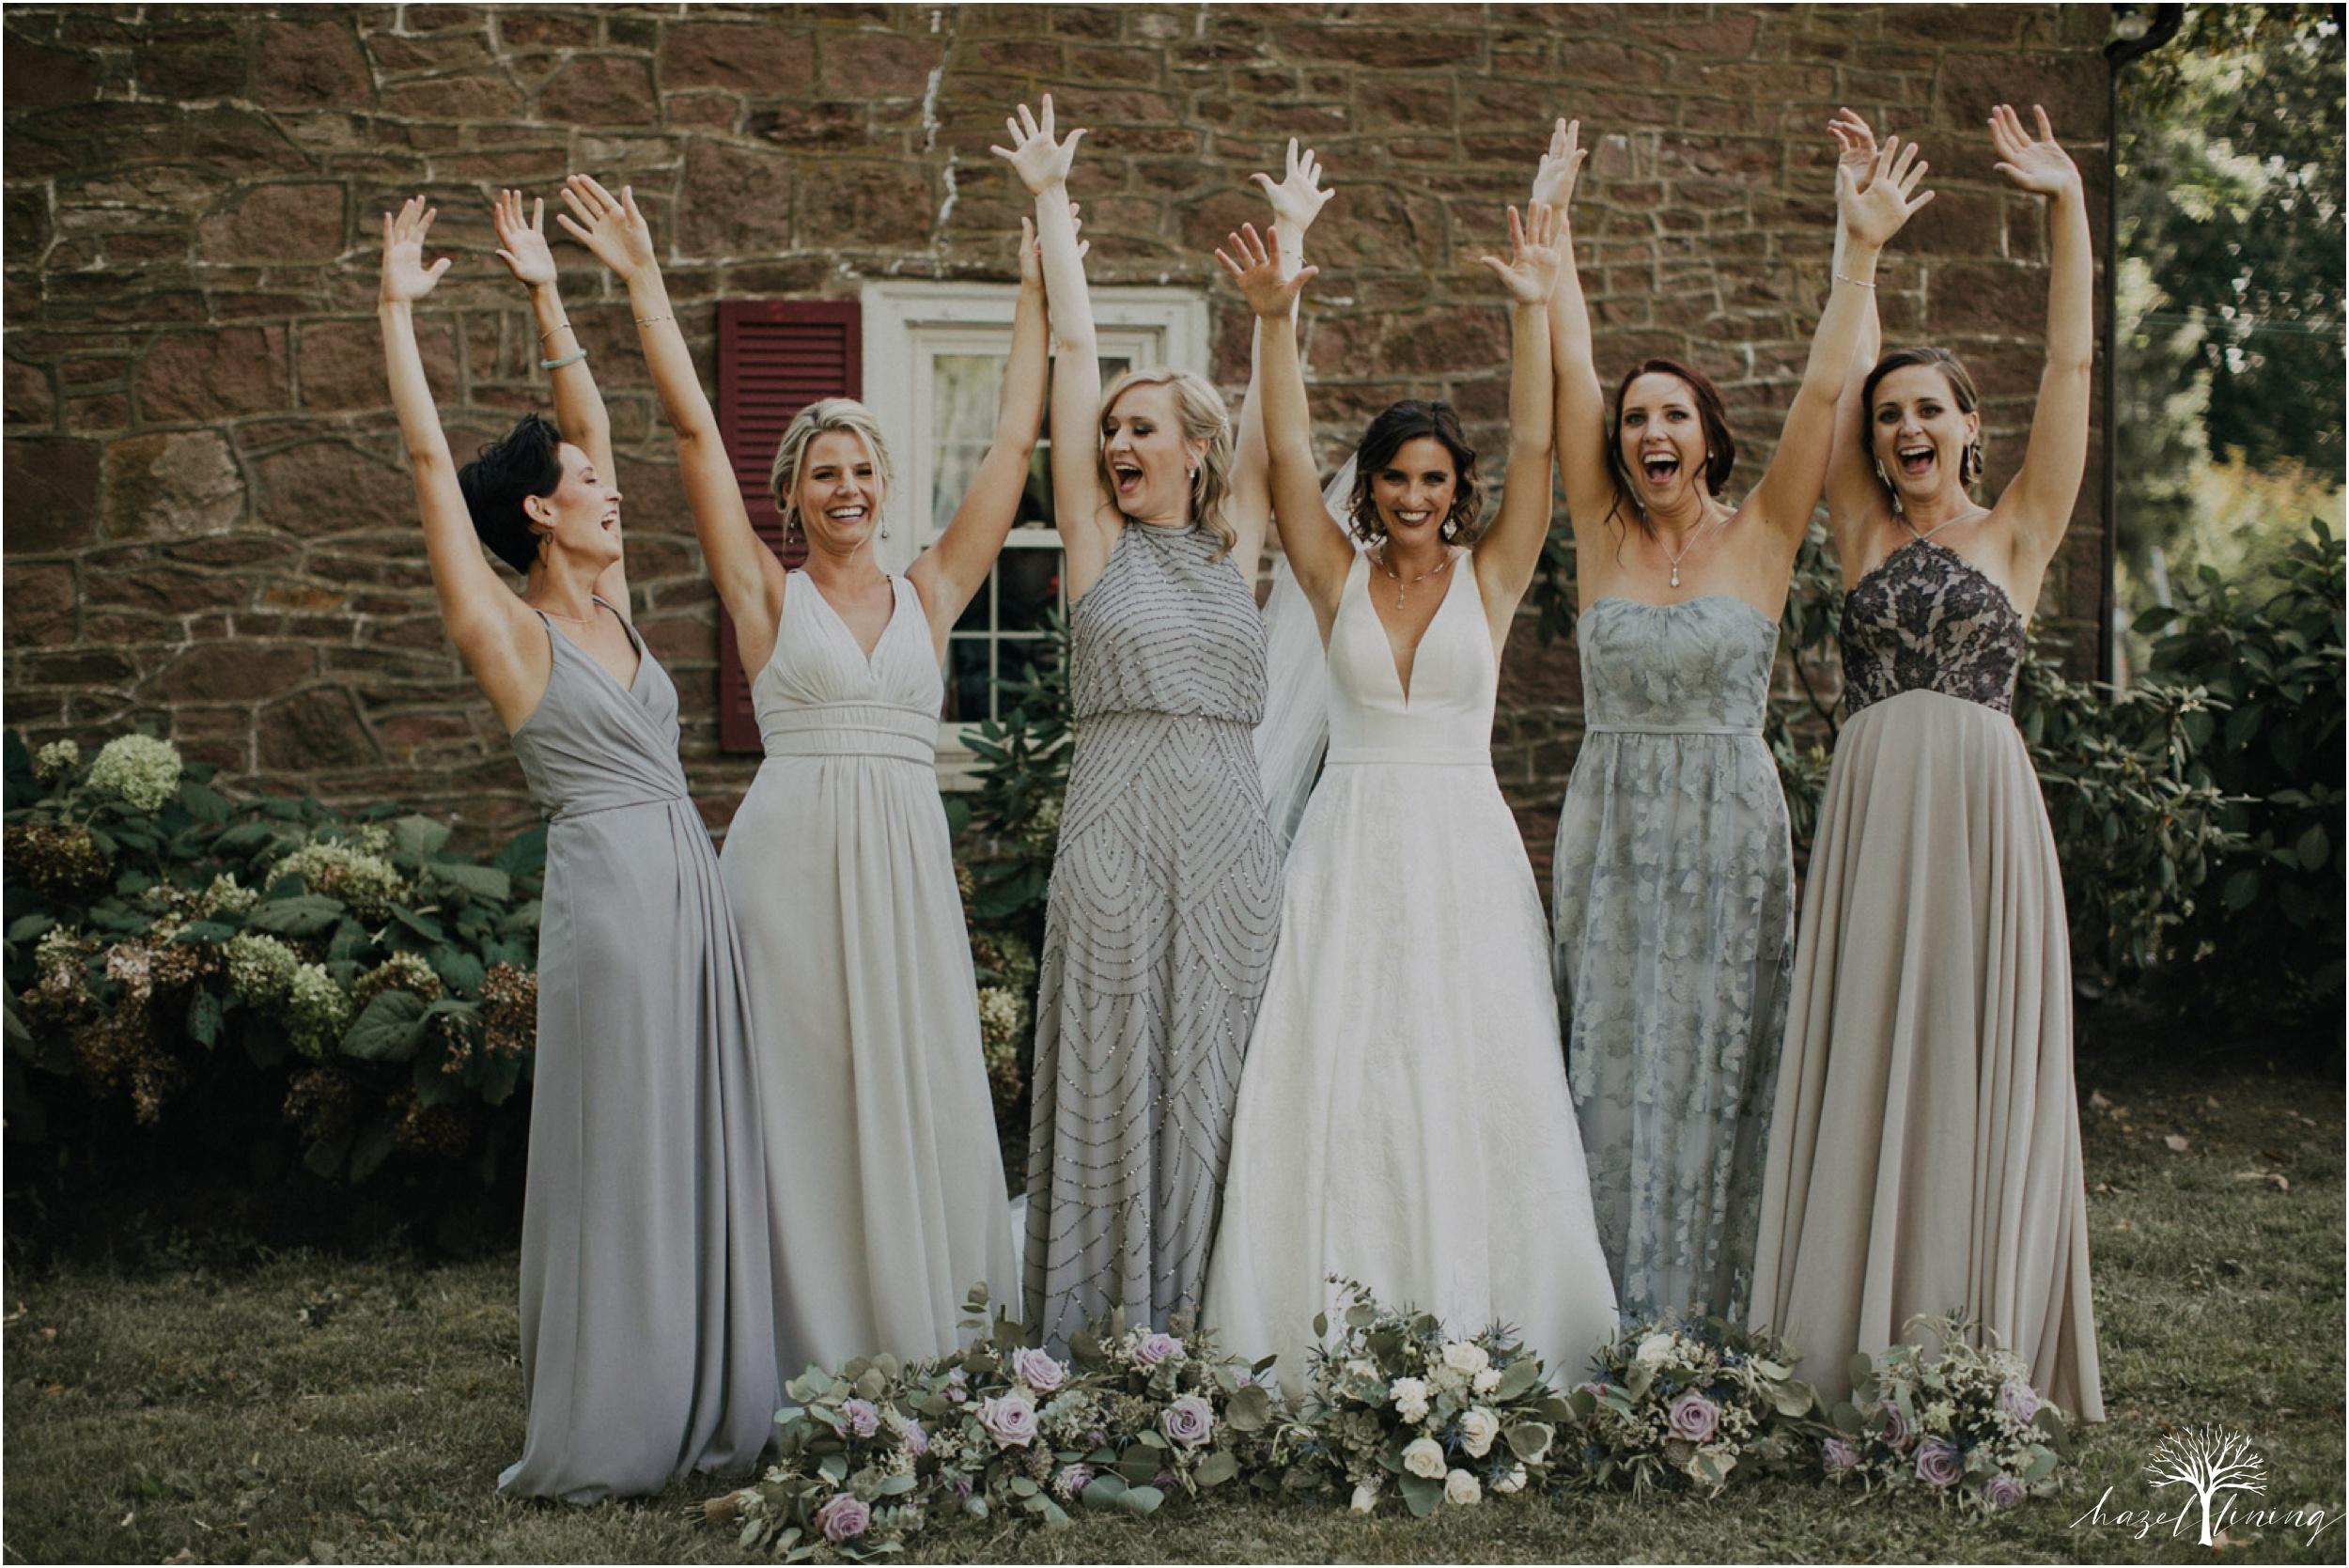 maureen-hepner-anthony-giordano-rose-bank-winery-newtow-pennsylvania-luxury-summer-wedding-hazel-lining-photography-destination-elopement-wedding-engagement-photography_0041.jpg